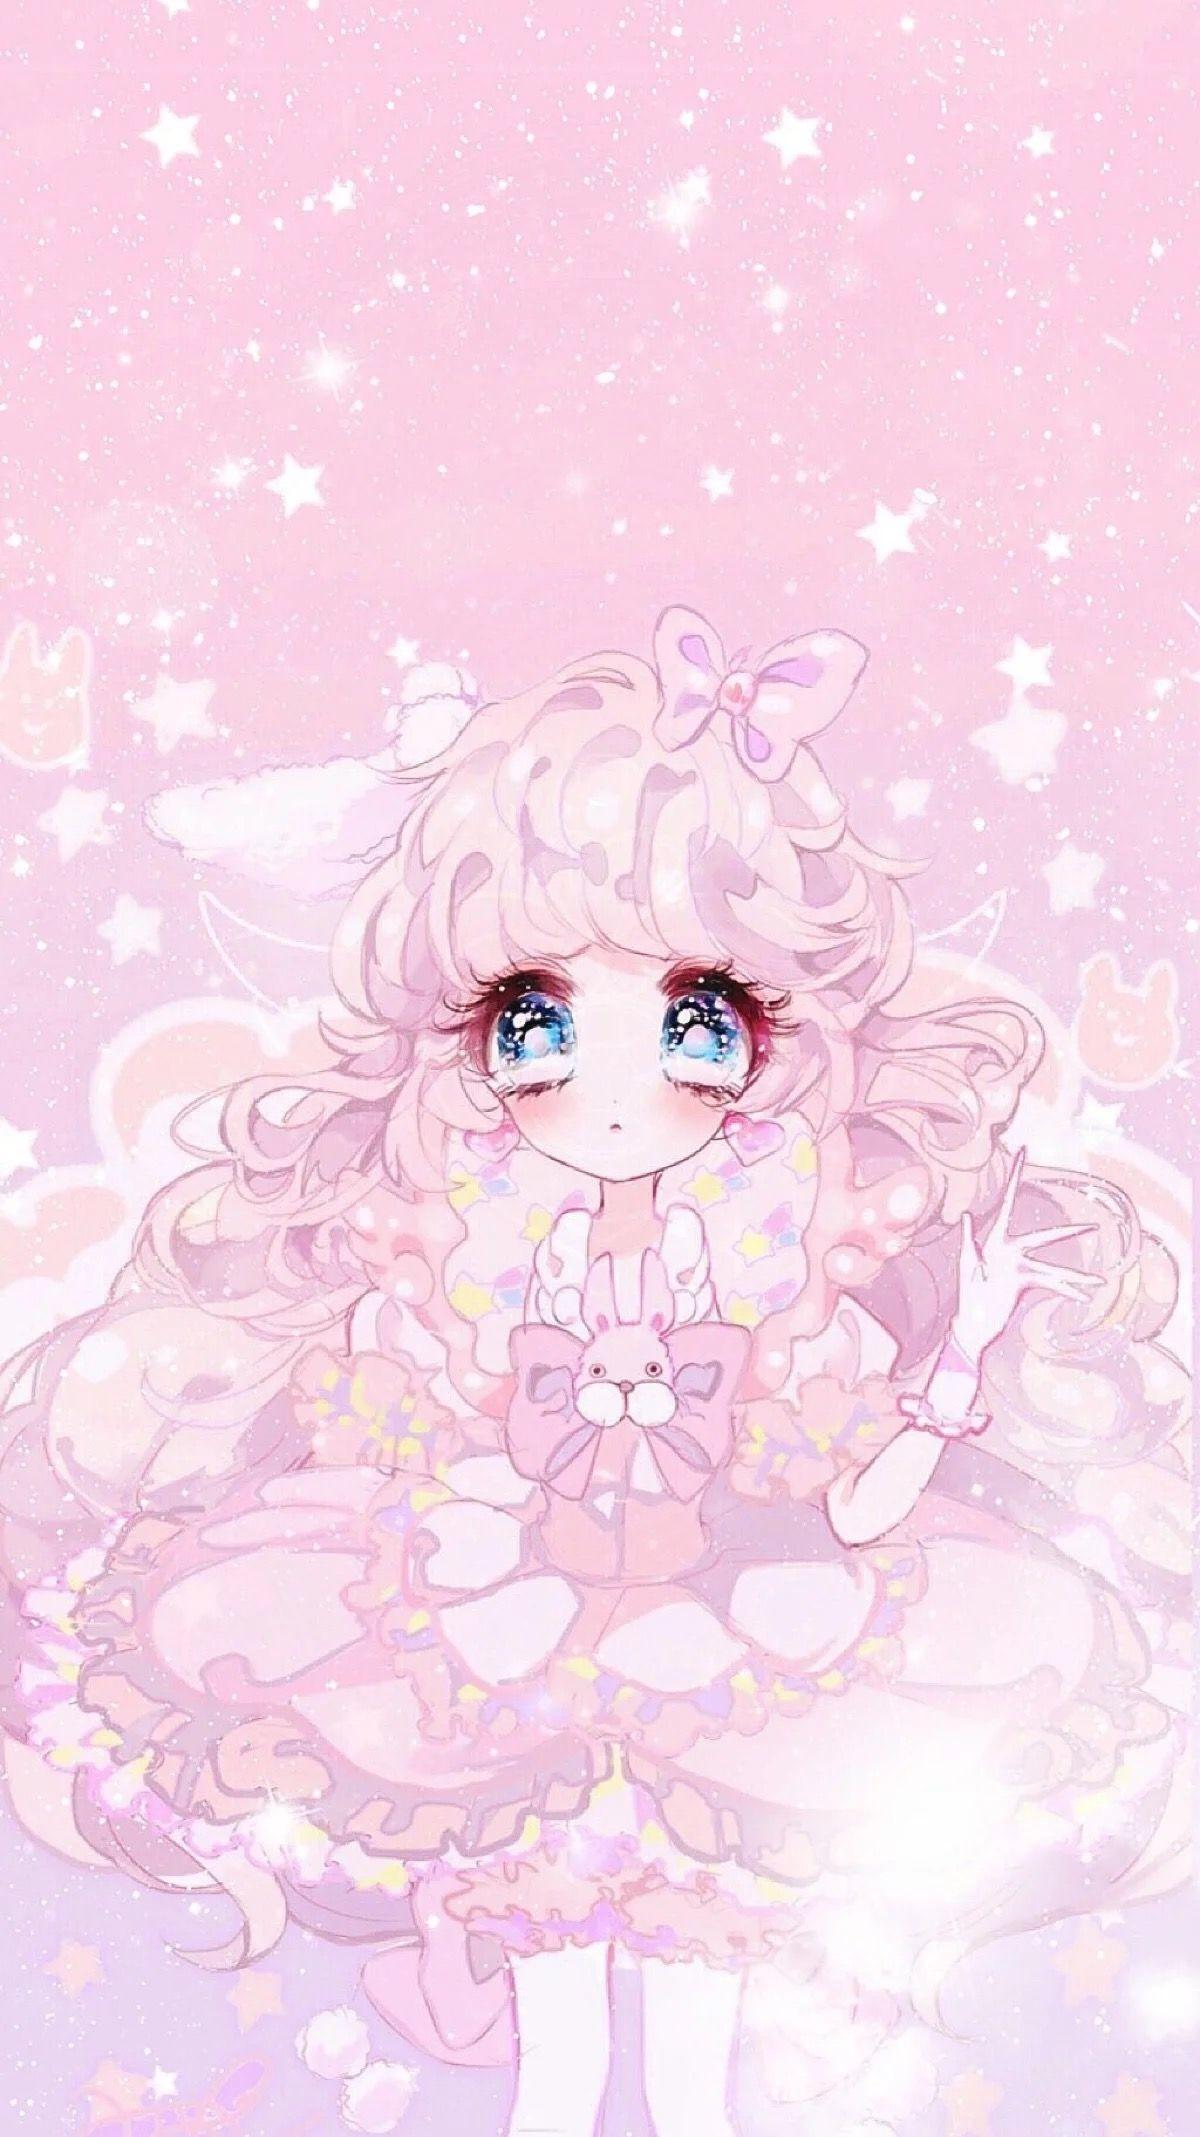 Kawaii Wallpaper Girl Wallpaper Kawaii Girl Kawaii Kawaii Pastel Anime Girl 1200x2137 Download Hd Wallpaper Wallpapertip